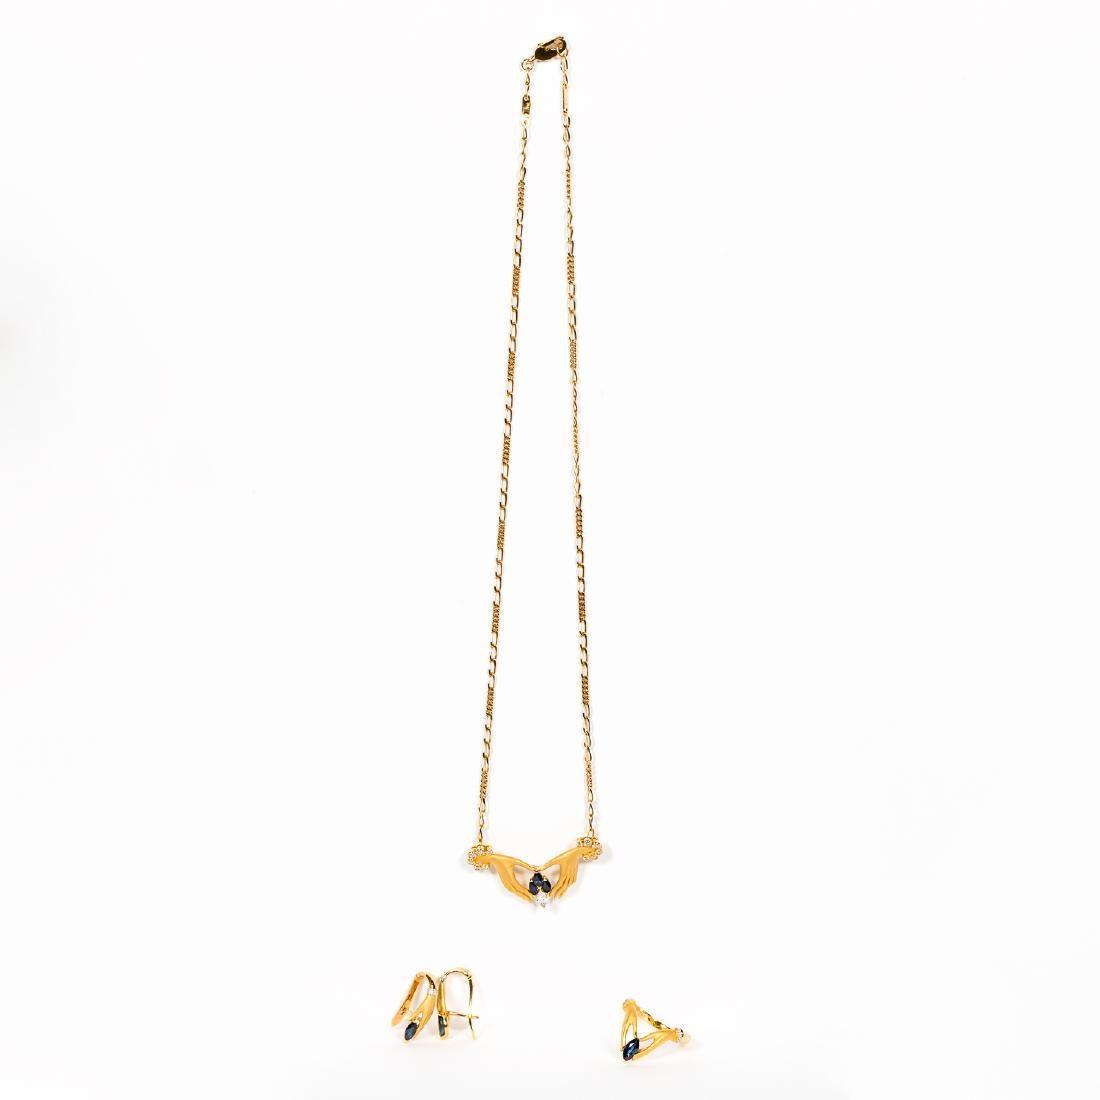 Carerra Y Carrera 18K Gold Hand Motif Jewelry Set